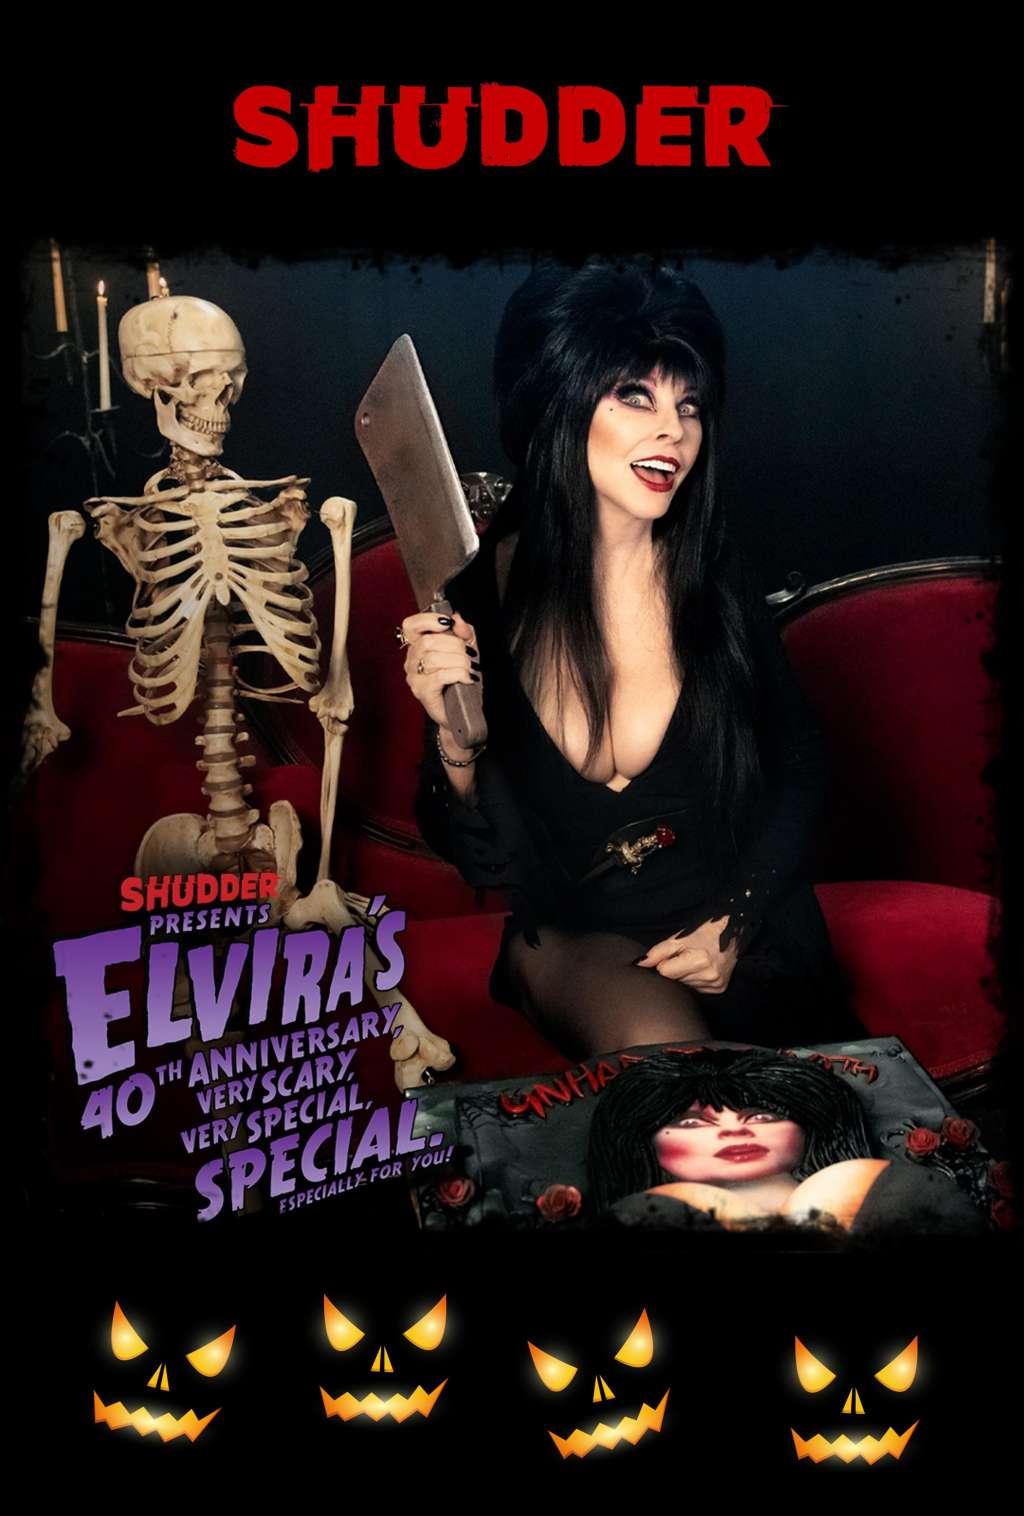 Elvira's 40th Anniversary, Very Scary, Very Special Special kapak